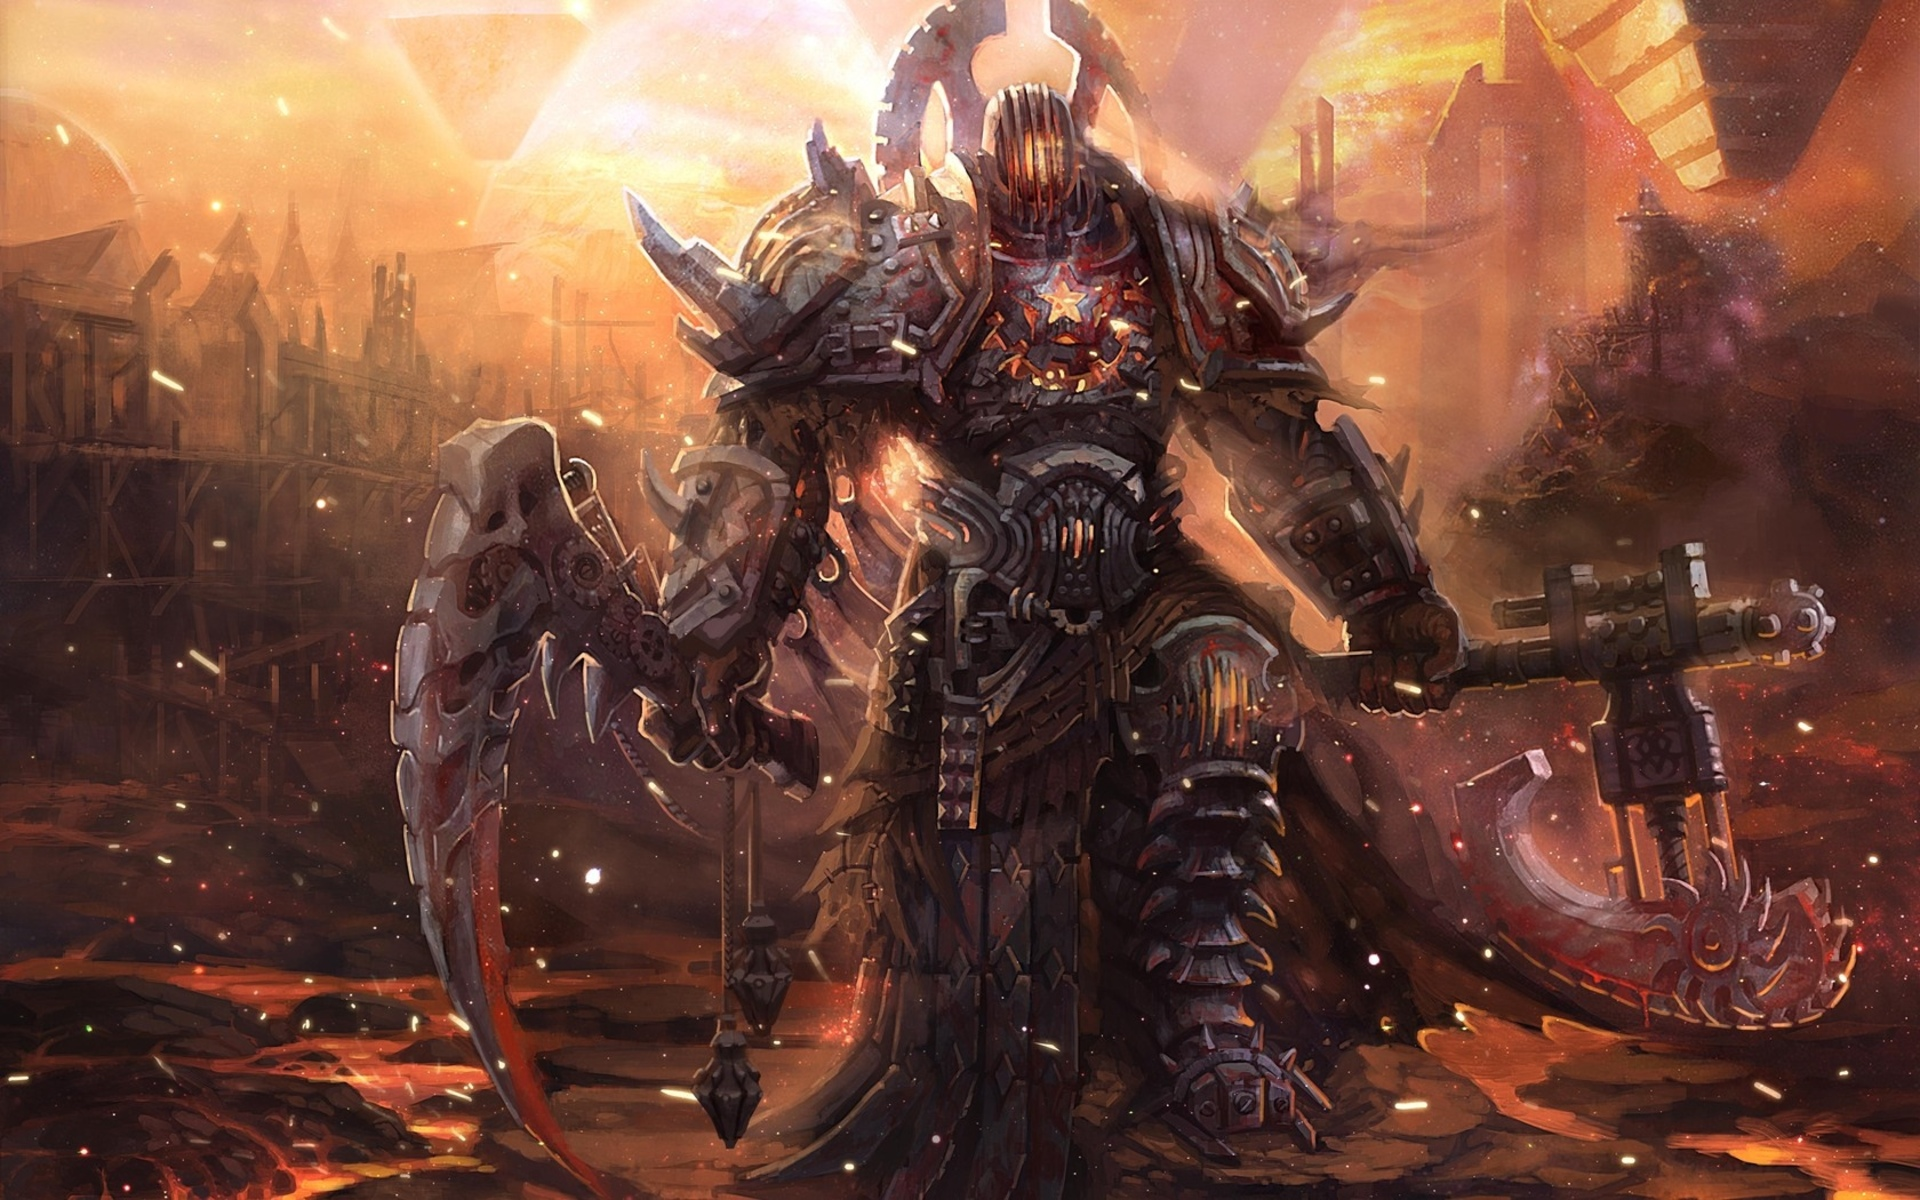 fantasy warrior weapons fire cities demon art wallpaper background